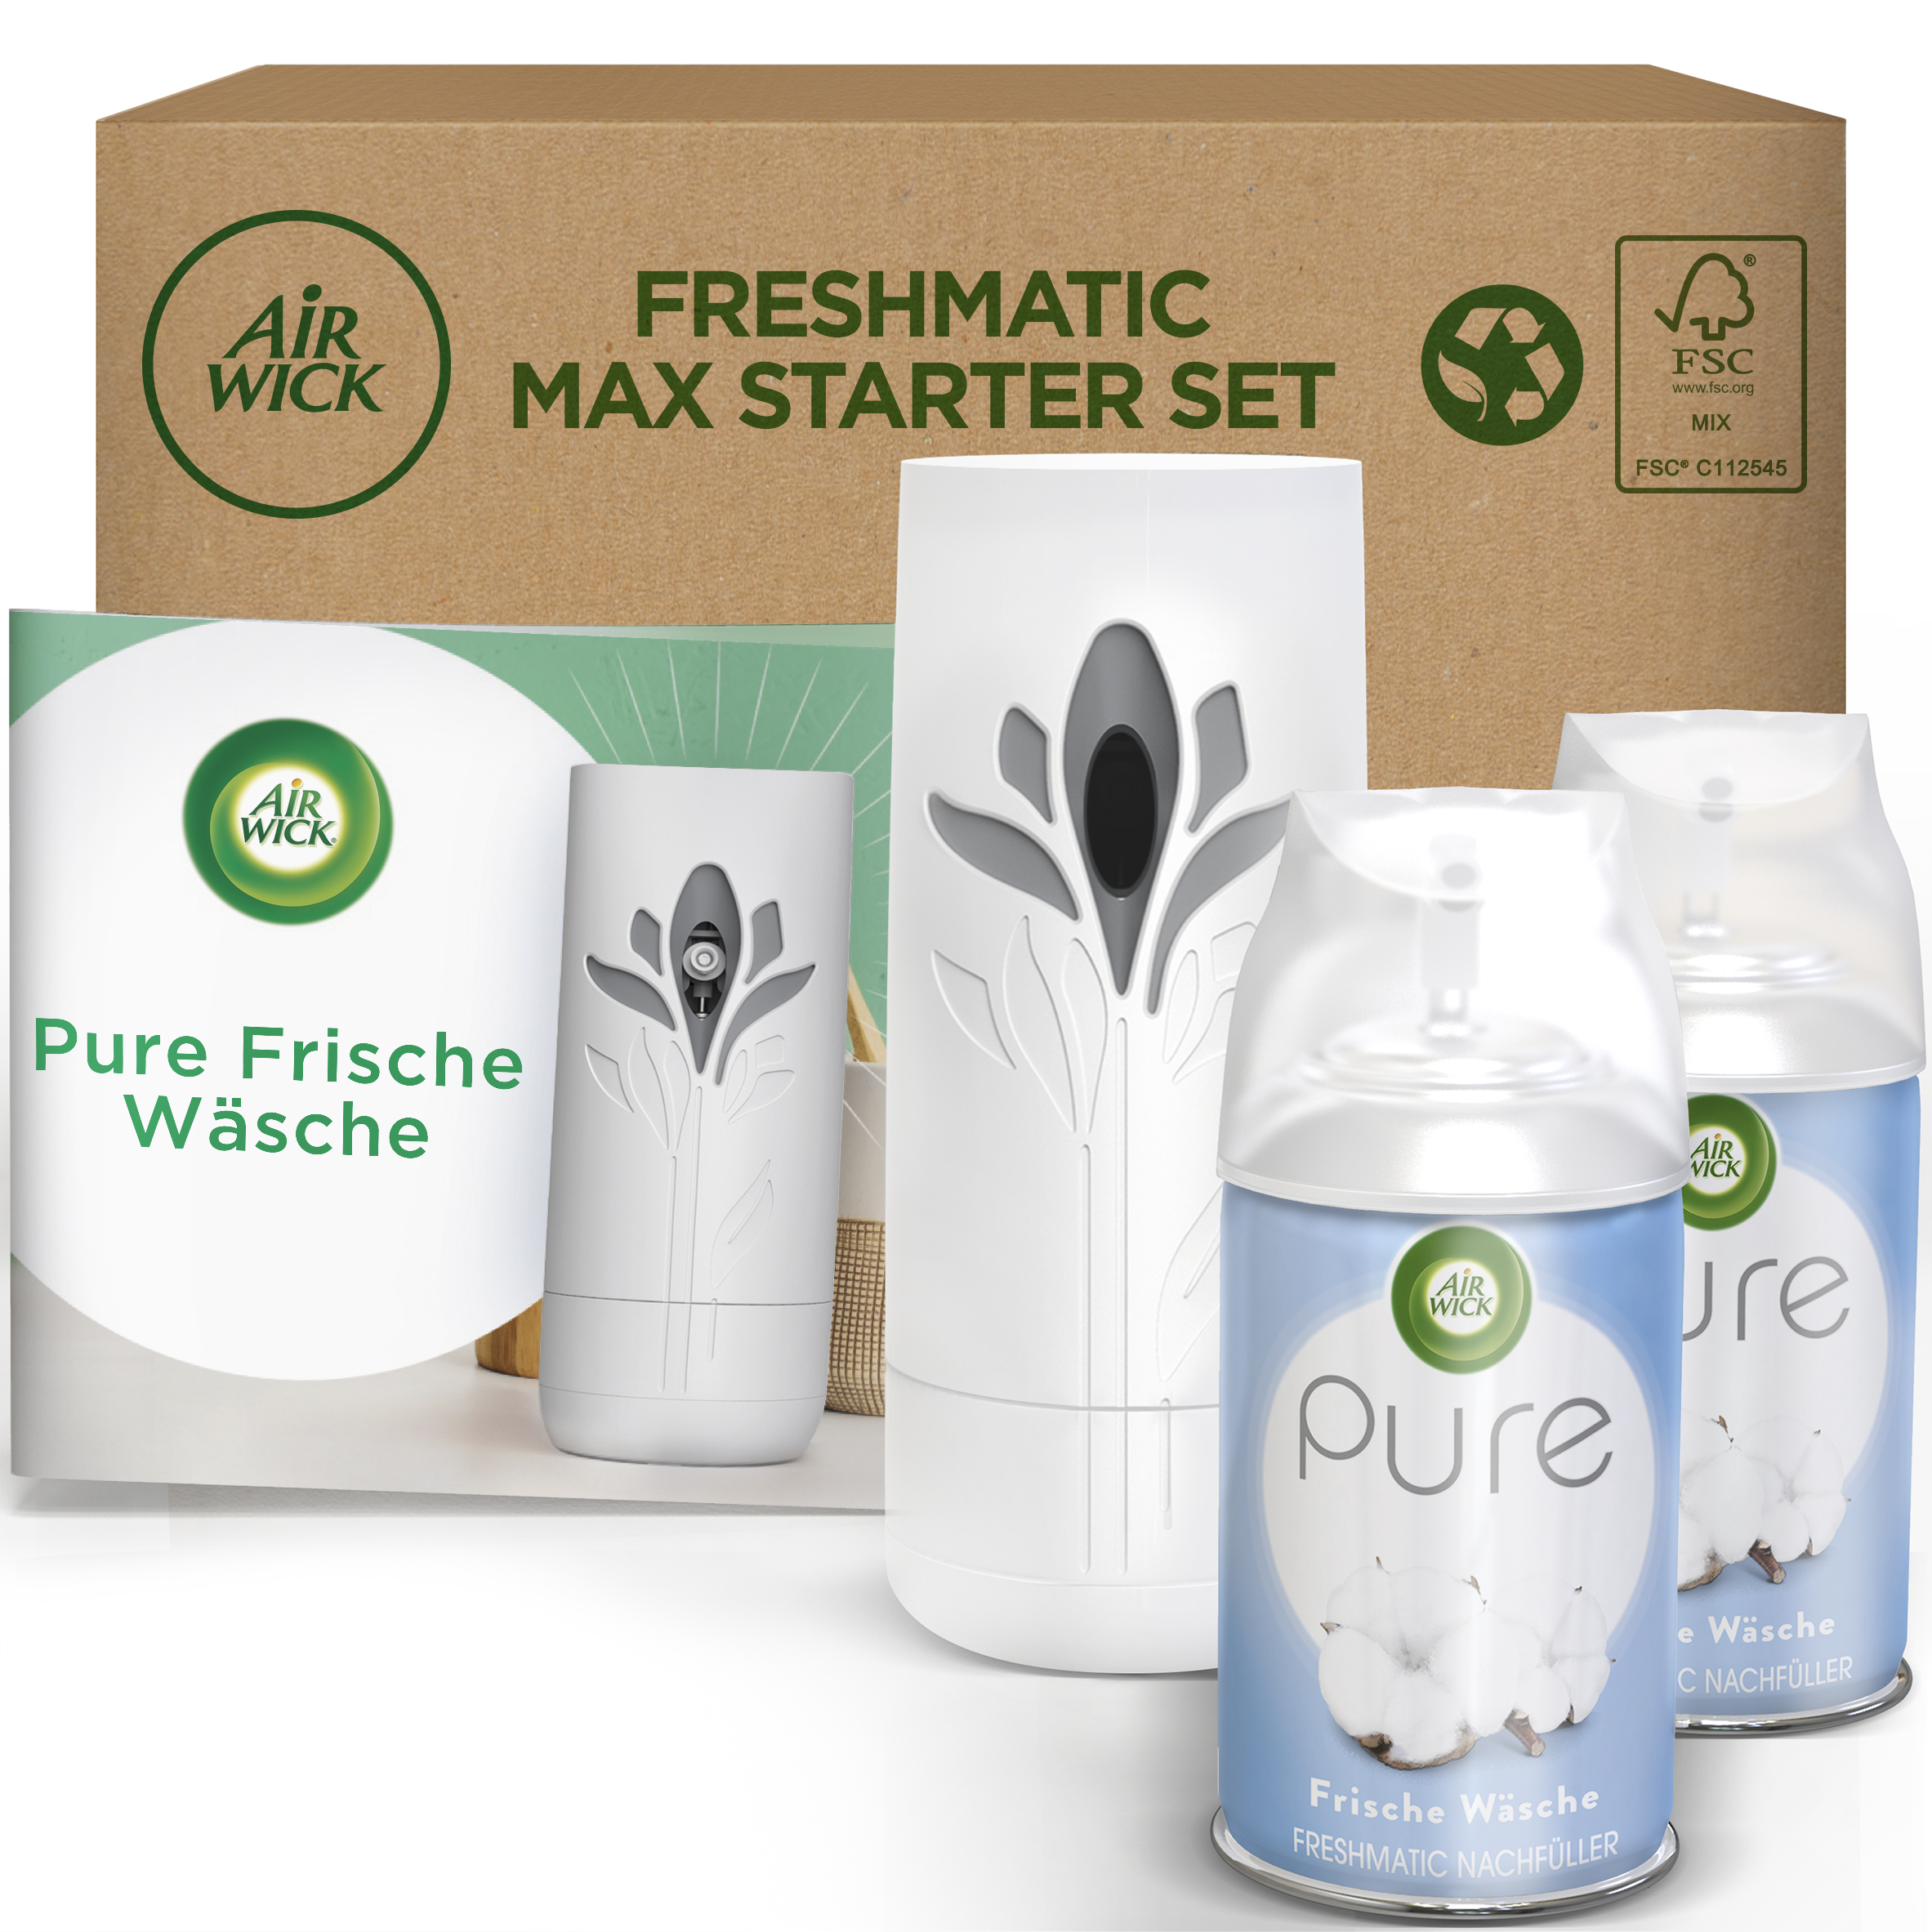 Air Wick Freshmatic Max eCom Starter-Set PURE Frische Wäsche